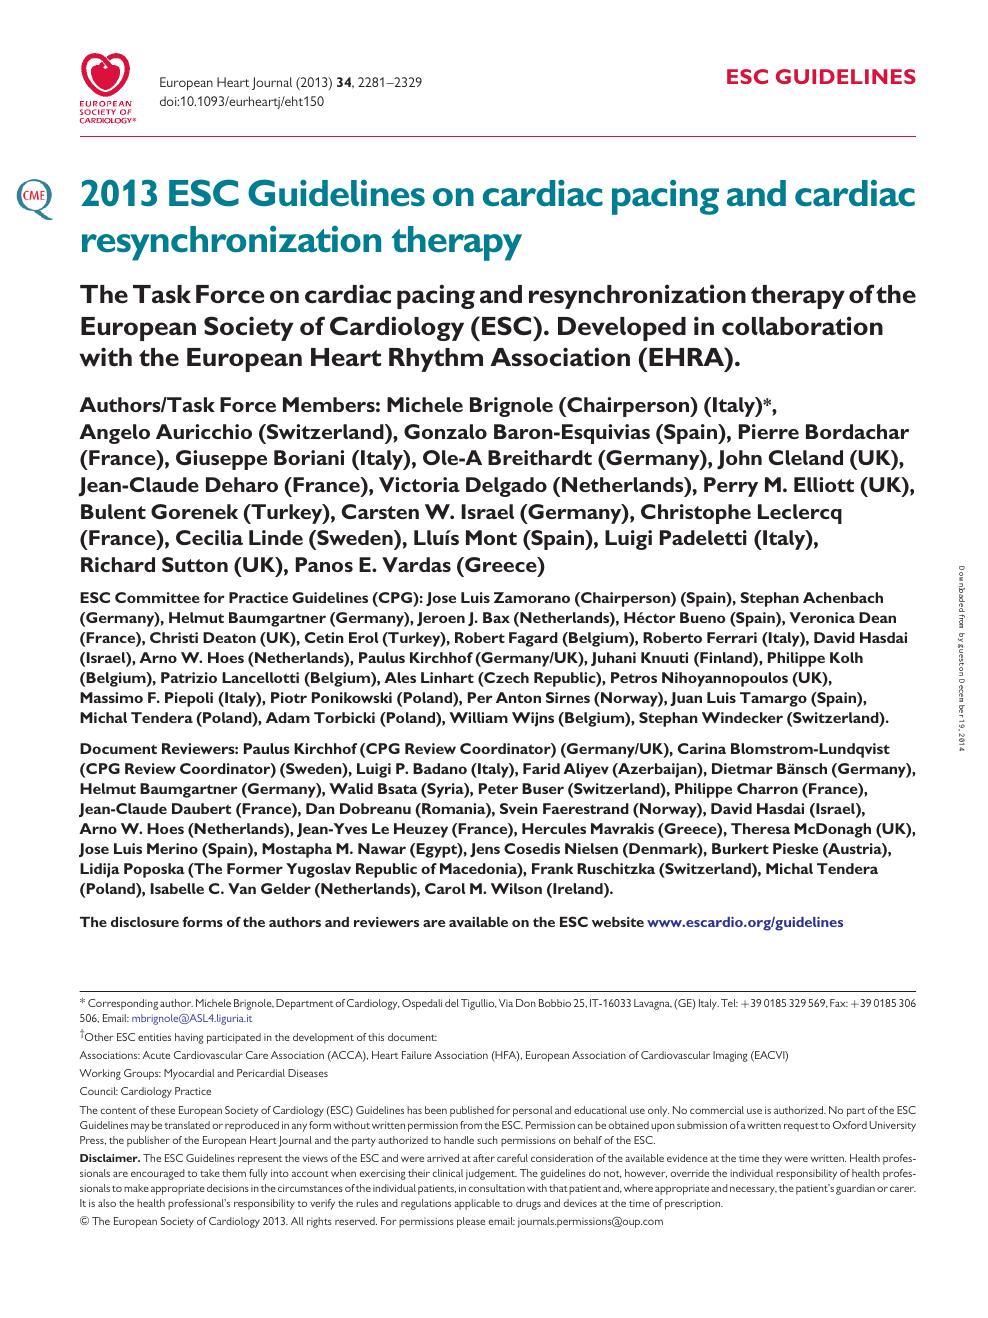 2013 ESC Guidelines on cardiac pacing and cardiac